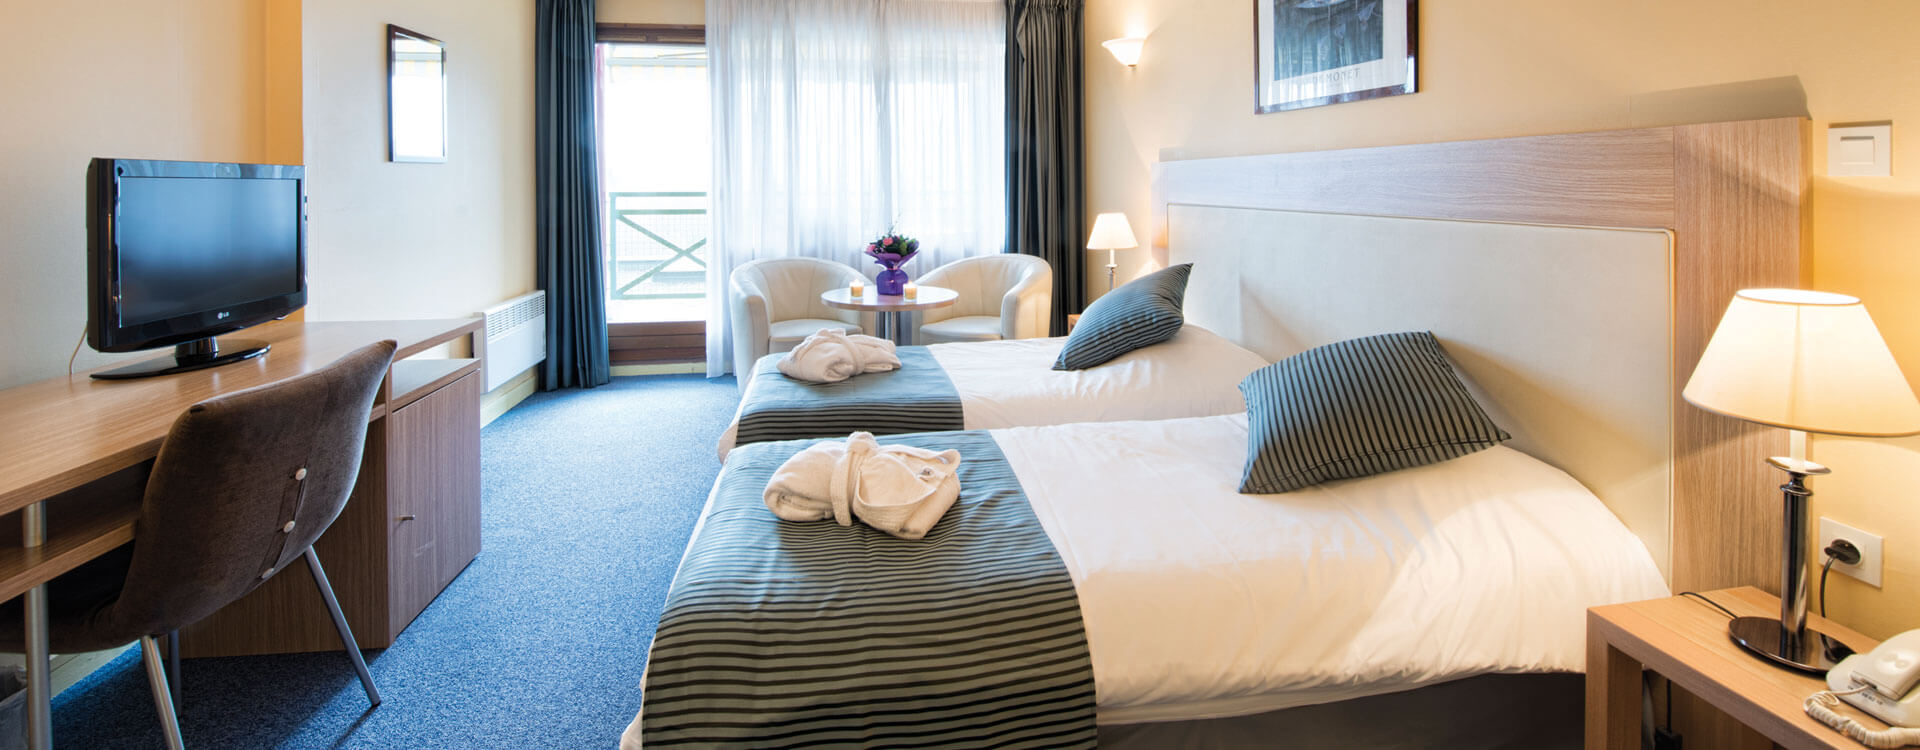 Chambre familiale - Hôtel & spa*** La Villa Marlioz à Aix-les-Bains